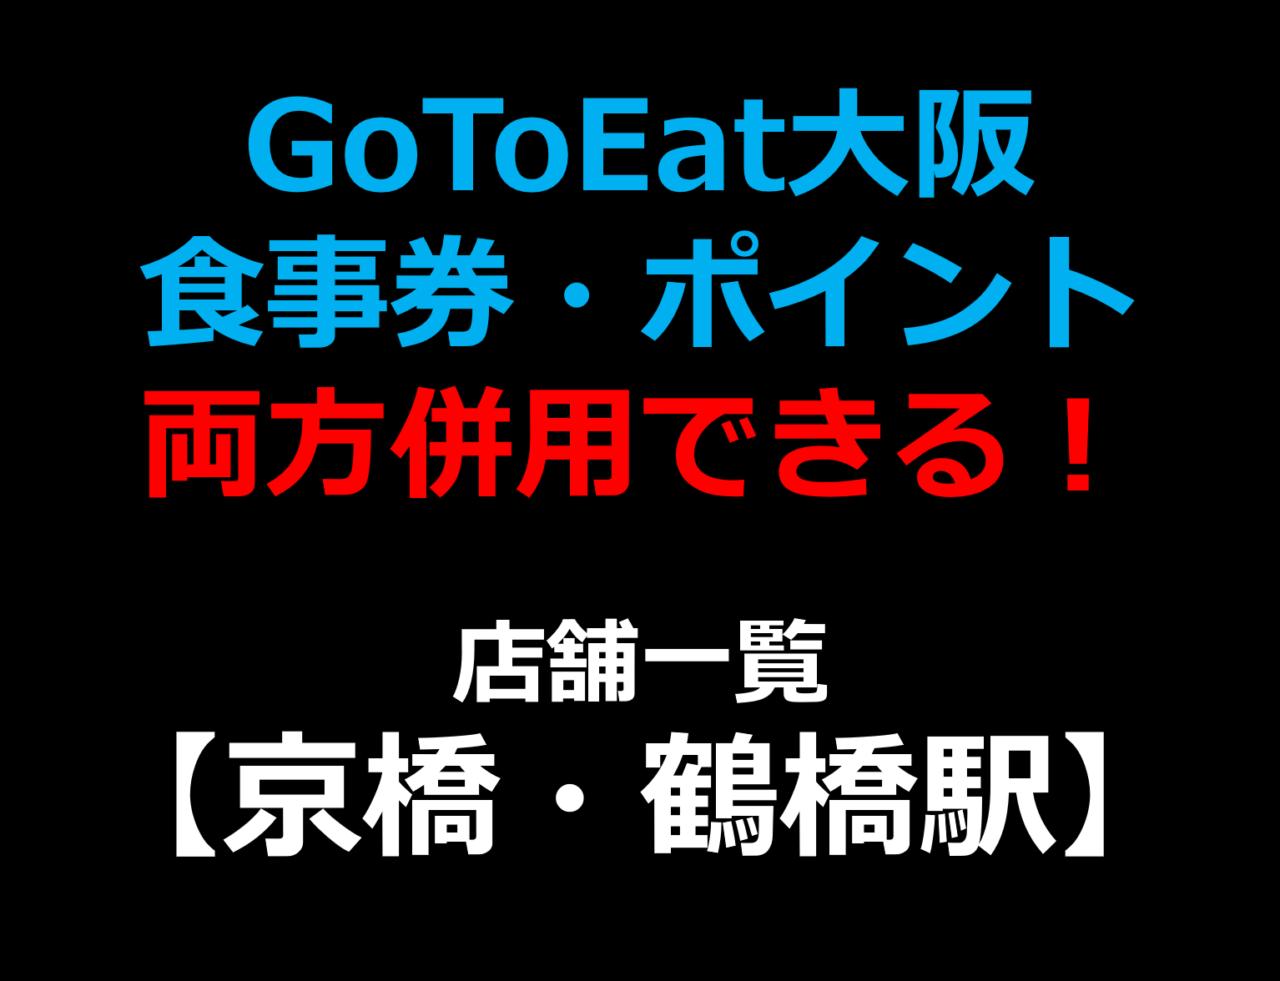 GoToEat大阪で食事券・予約サイトのポイント両方併用できる!使える!店舗一覧 【京橋駅,鶴橋駅】